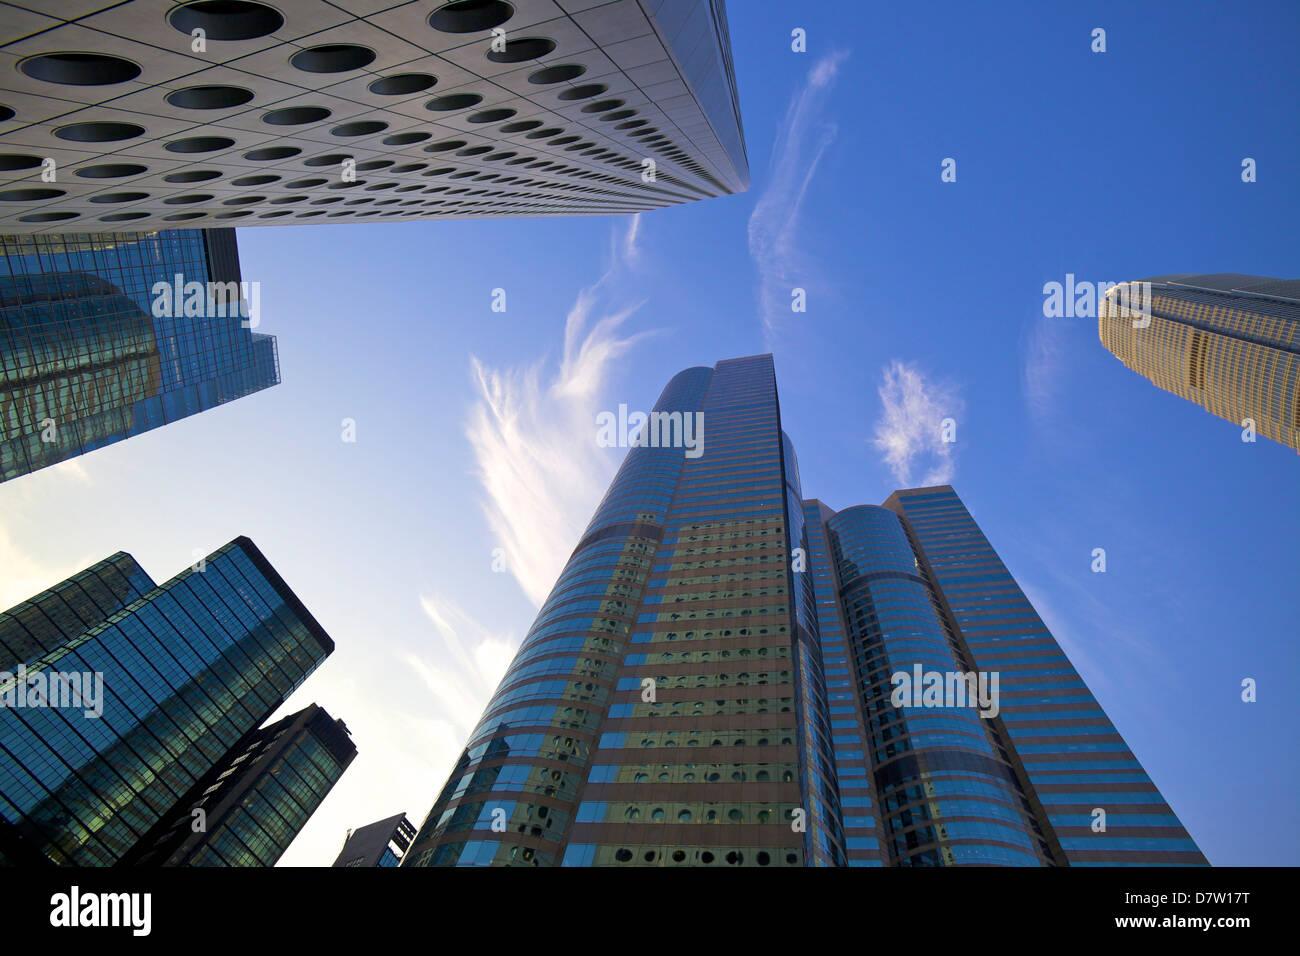 Central Business District, Hong Kong, China - Stock Image